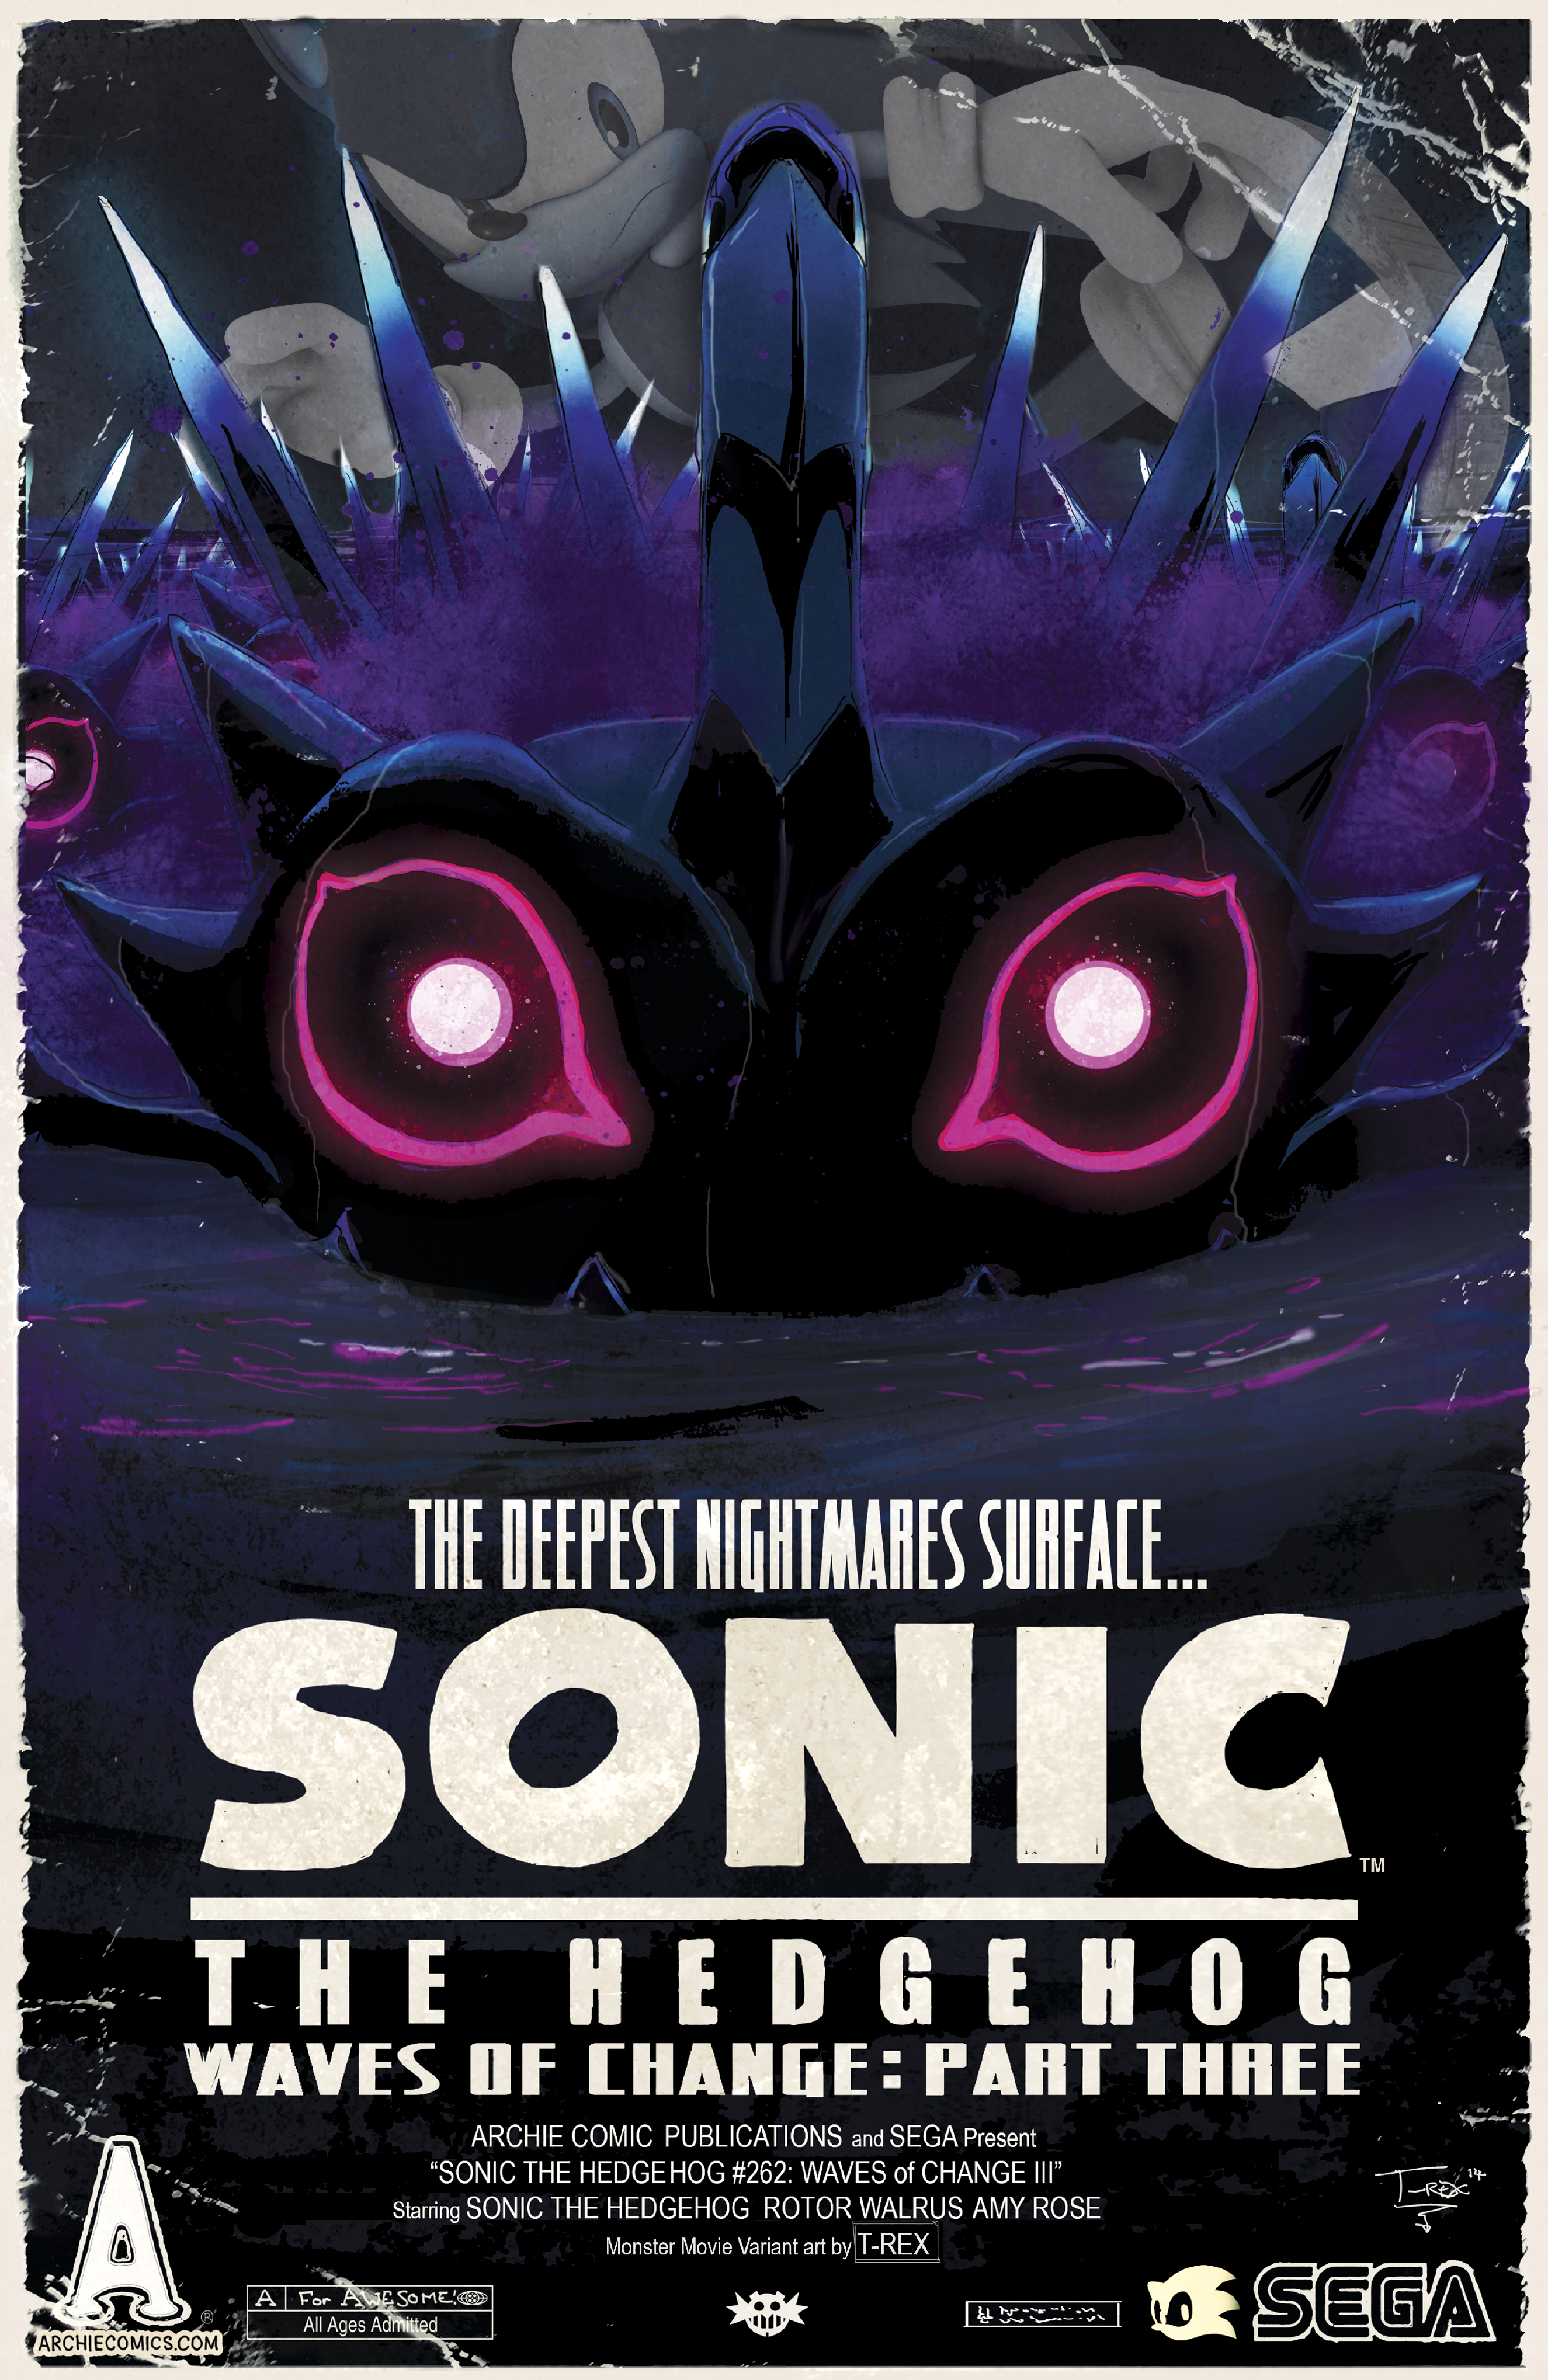 Archie comics archie comics sneak peek of the week major spoilers - Sonicthehedgehog_262 Sonicthehedgehog_262variant